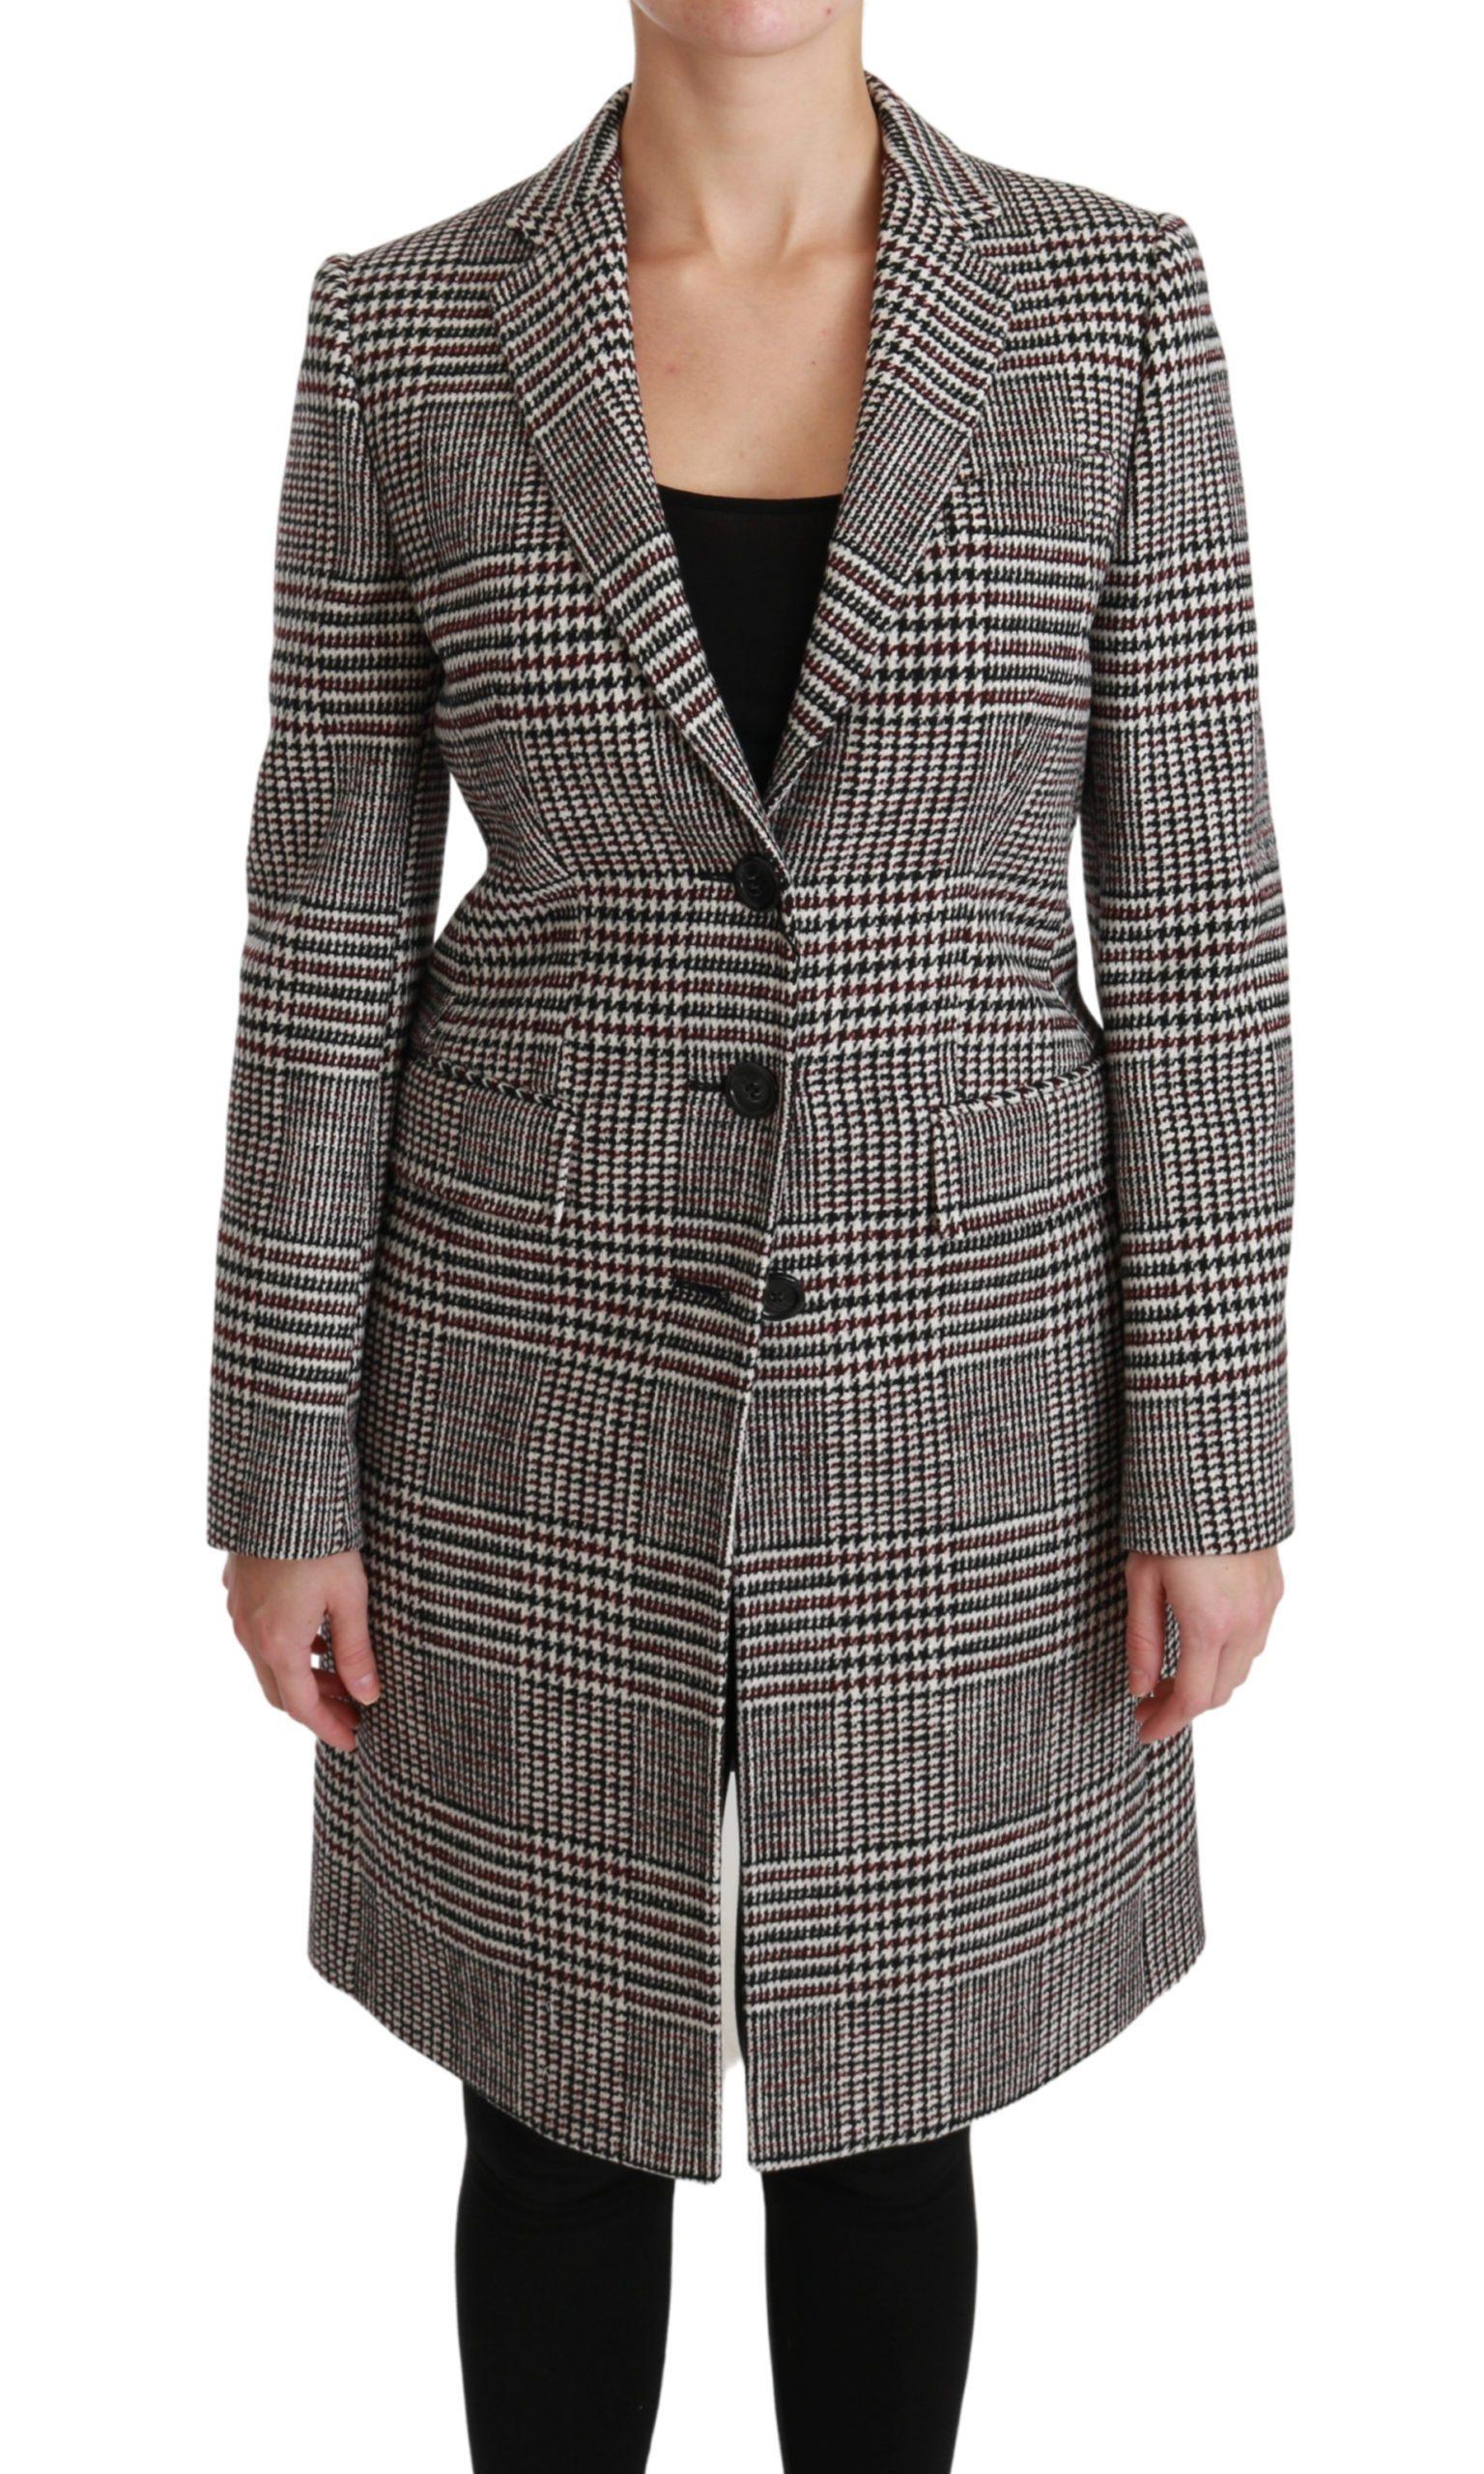 Dolce & Gabbana Women's Trench Knee Long Jacket Coat Multicolor JKT2520 - IT40 S